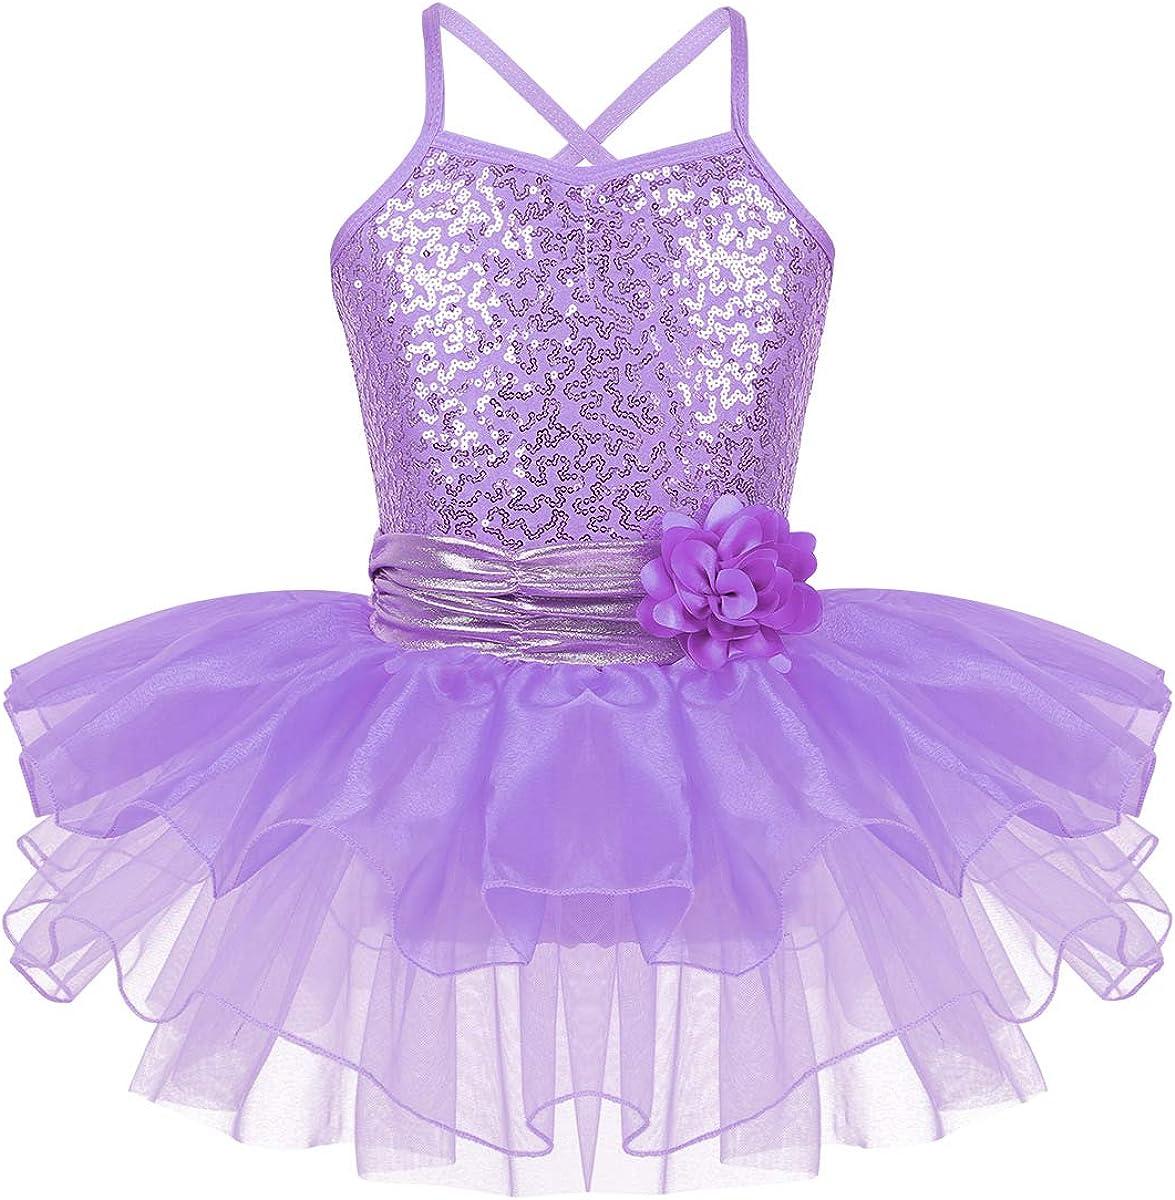 Girls Gymnastics Ballet Leotard Dress Tutu Skirt Skate Kids Dance Wear Costumes